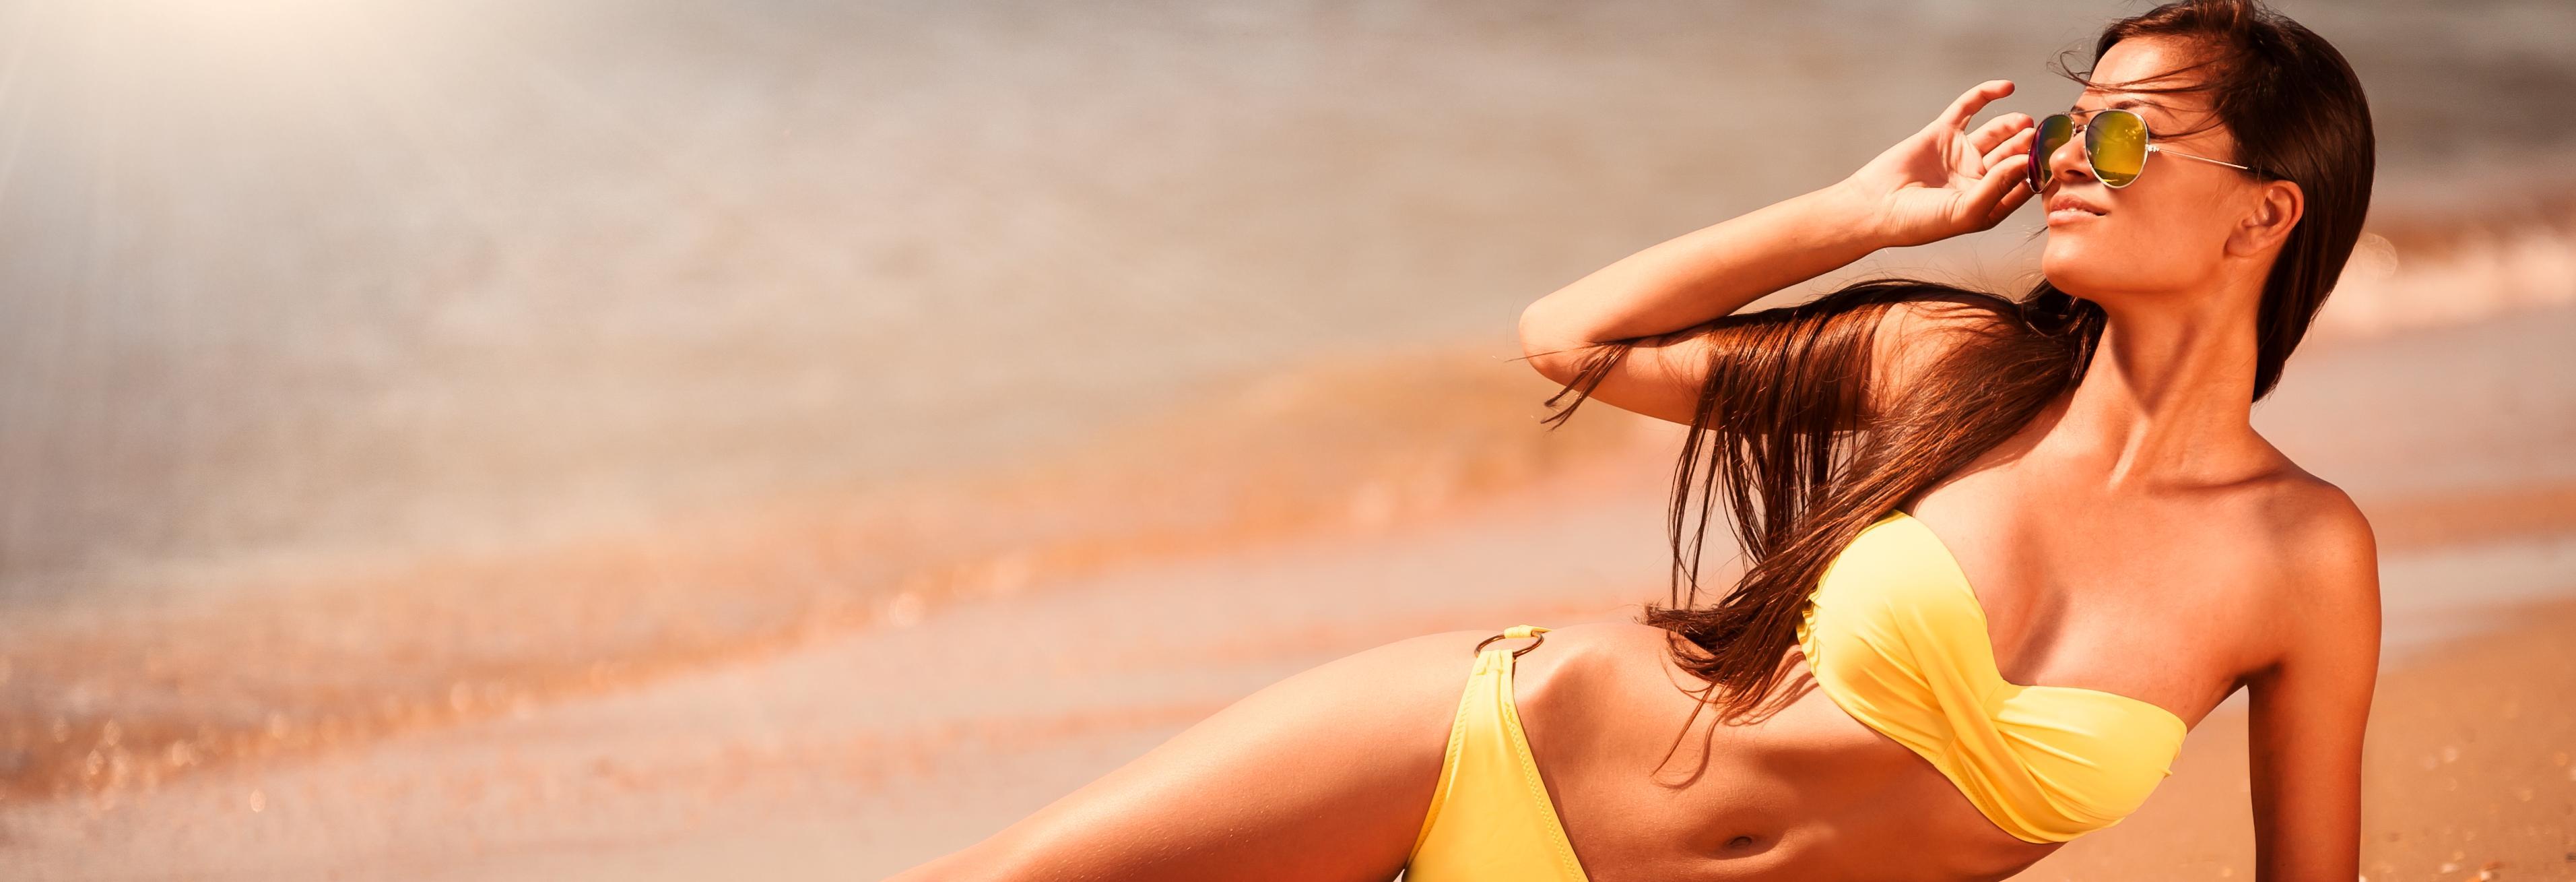 solar tan tanning salon banner dayton ohio